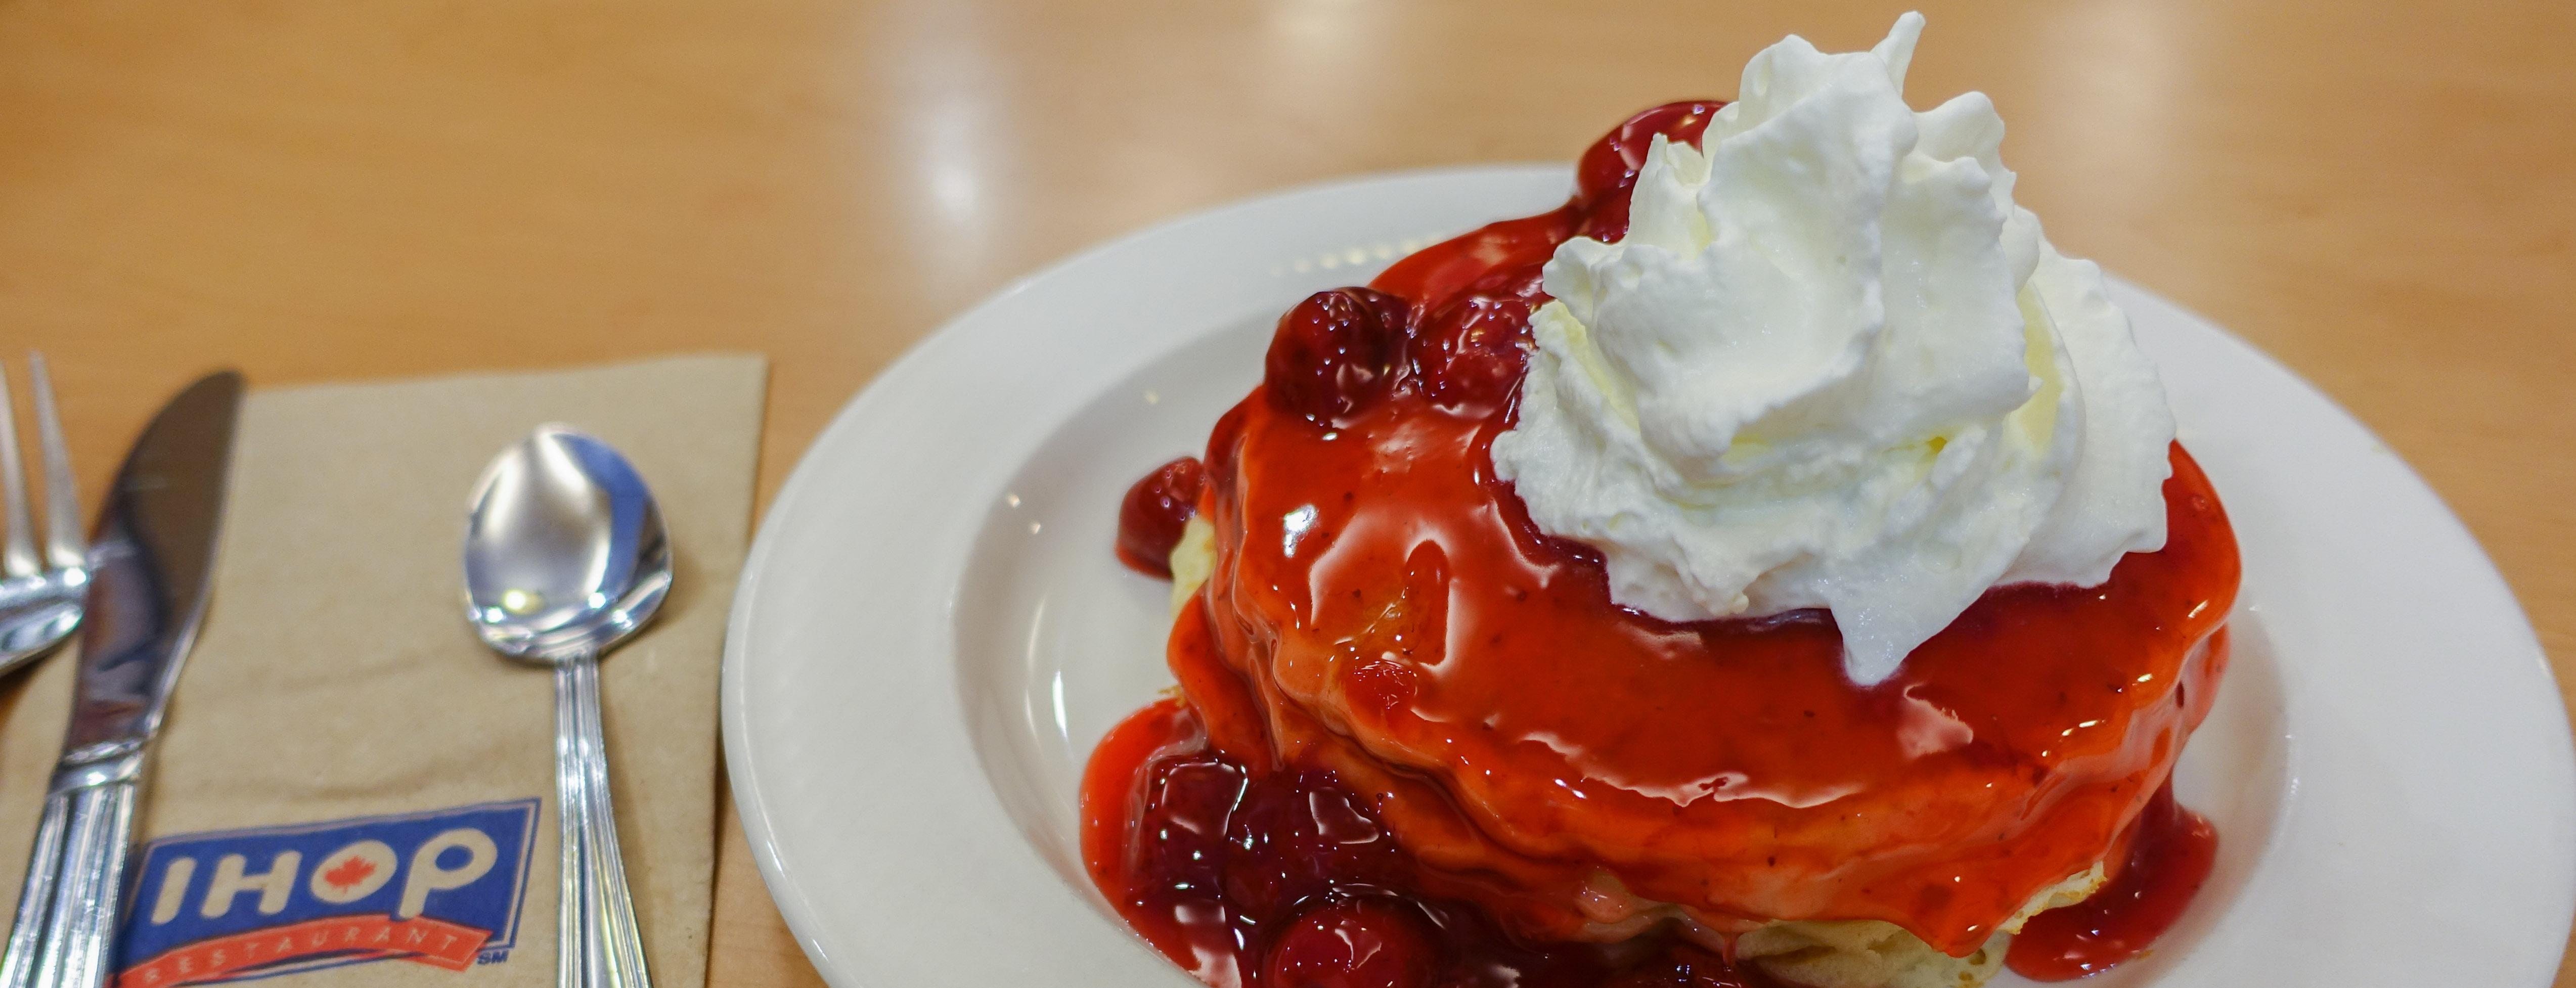 A free birthday pancake meal